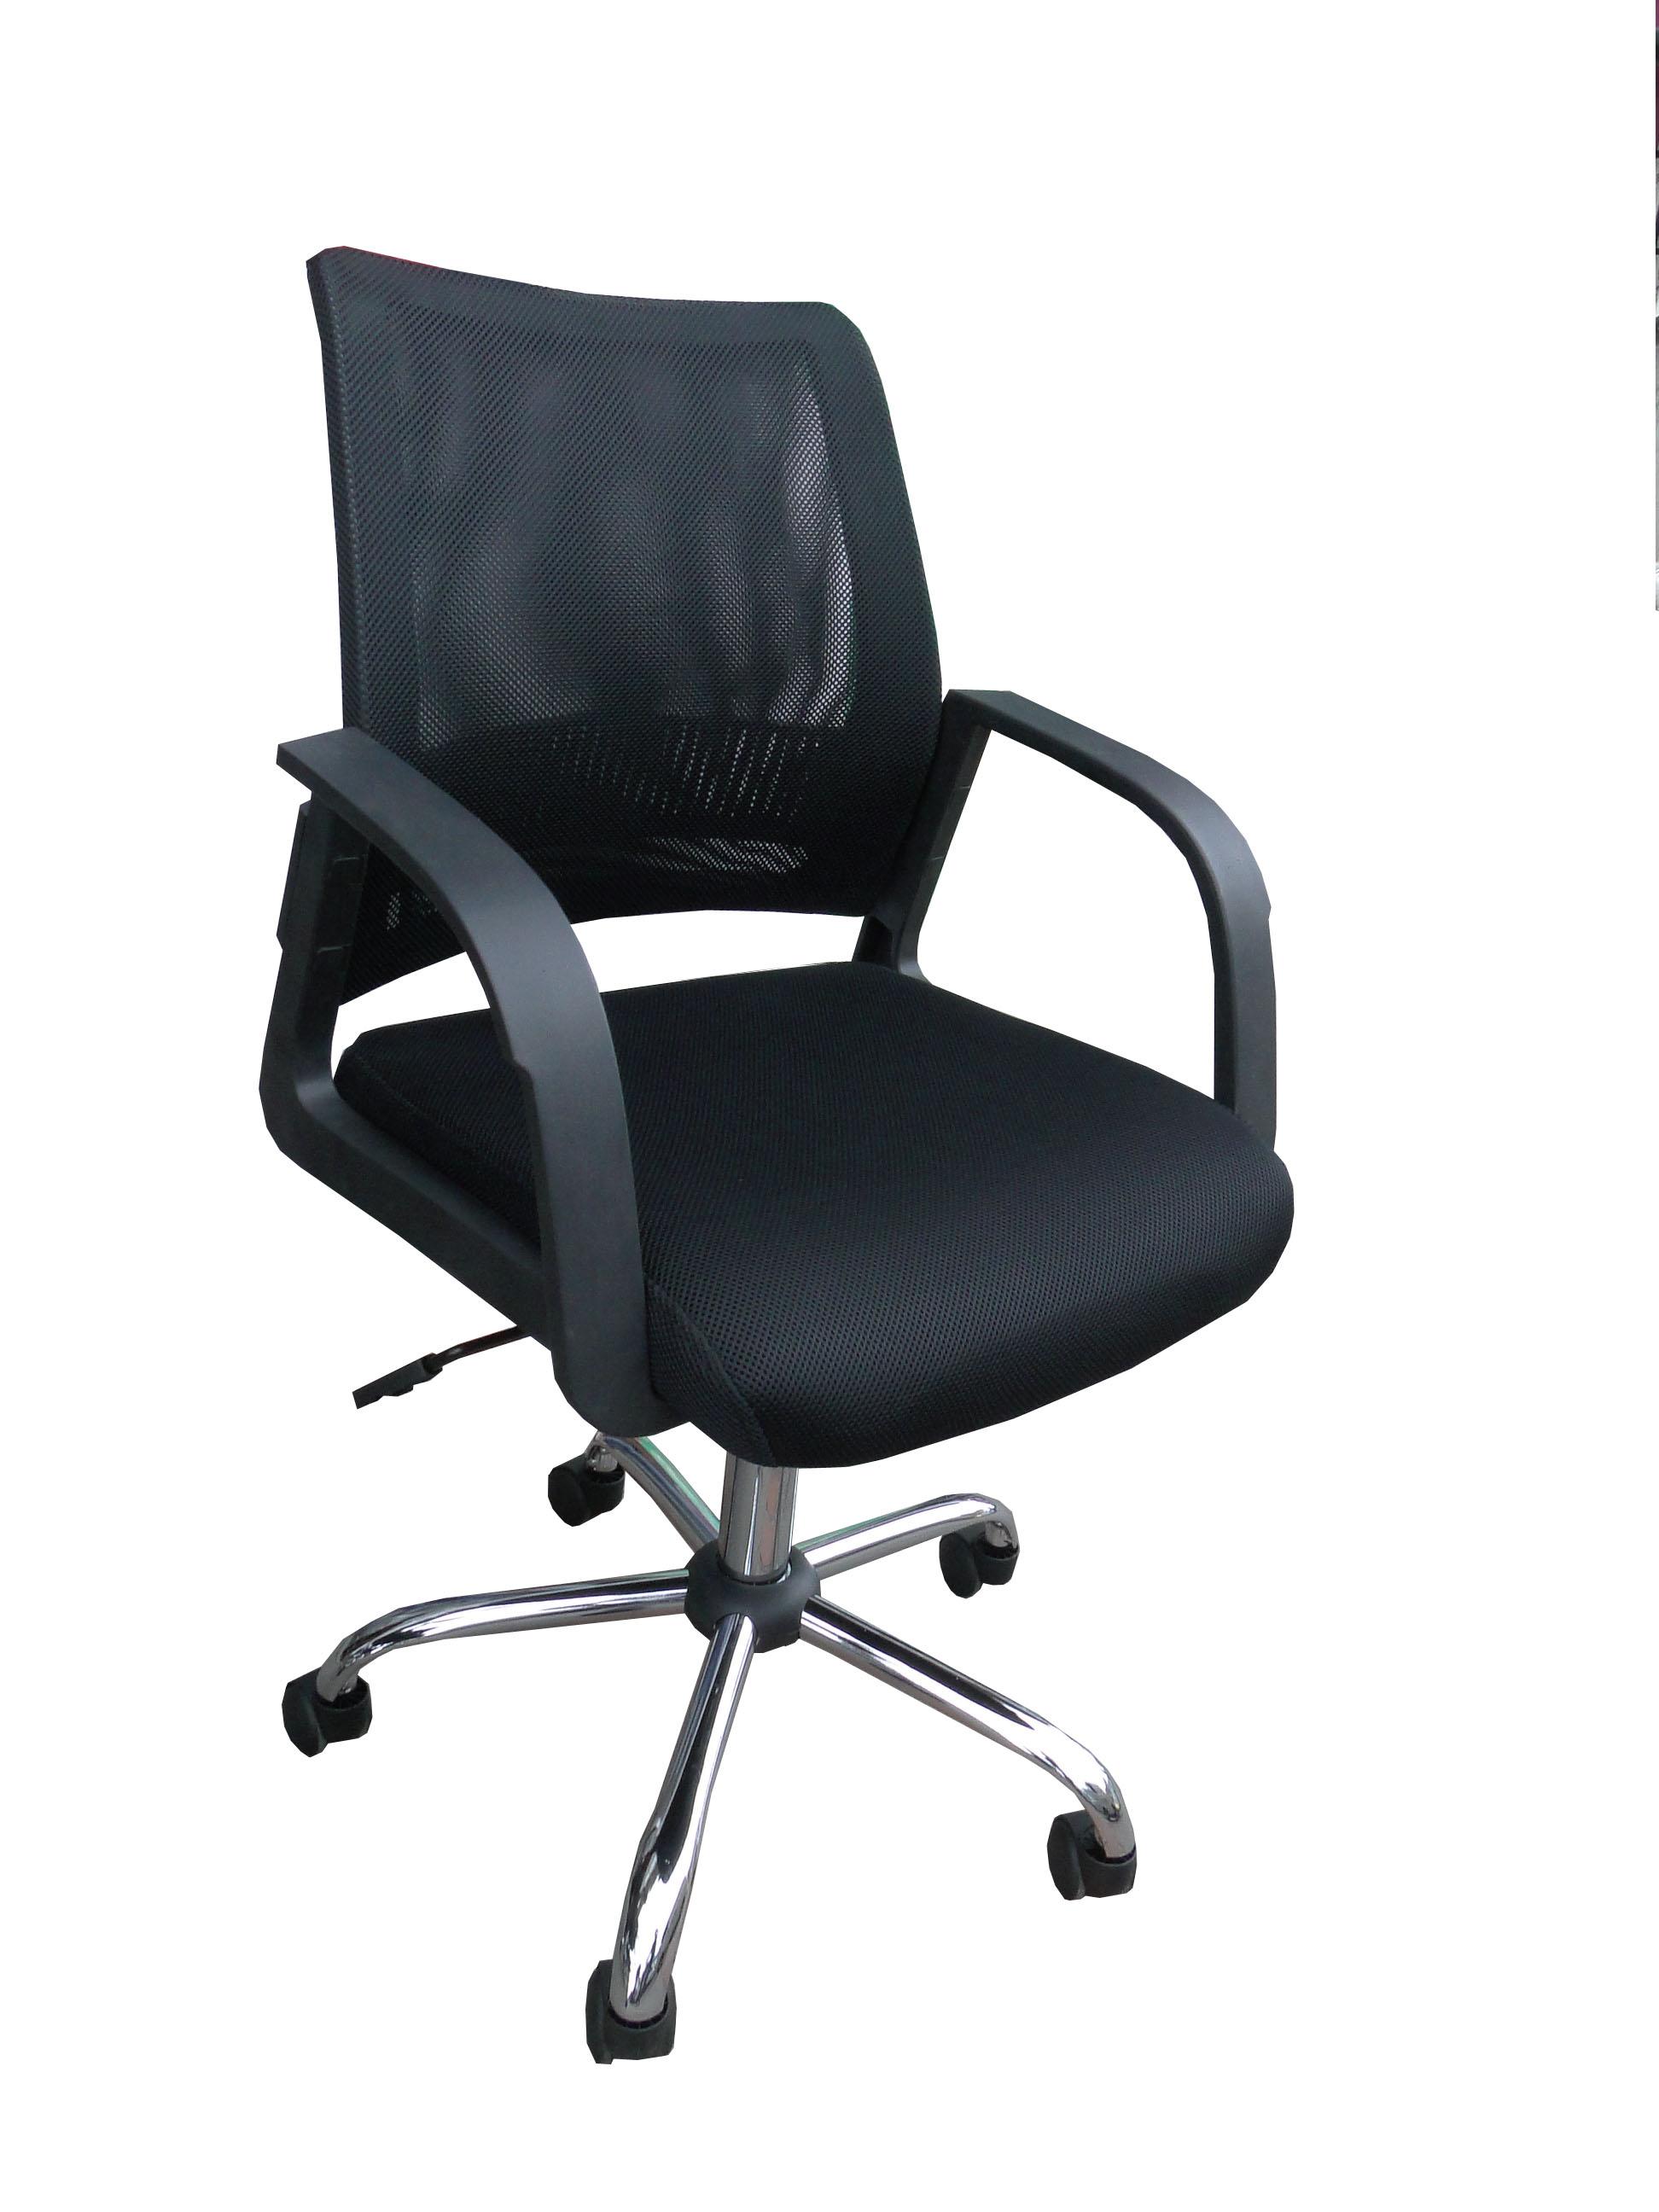 Sillas para oficina muebles bogota muebles oficina for Muebles de oficina bogota